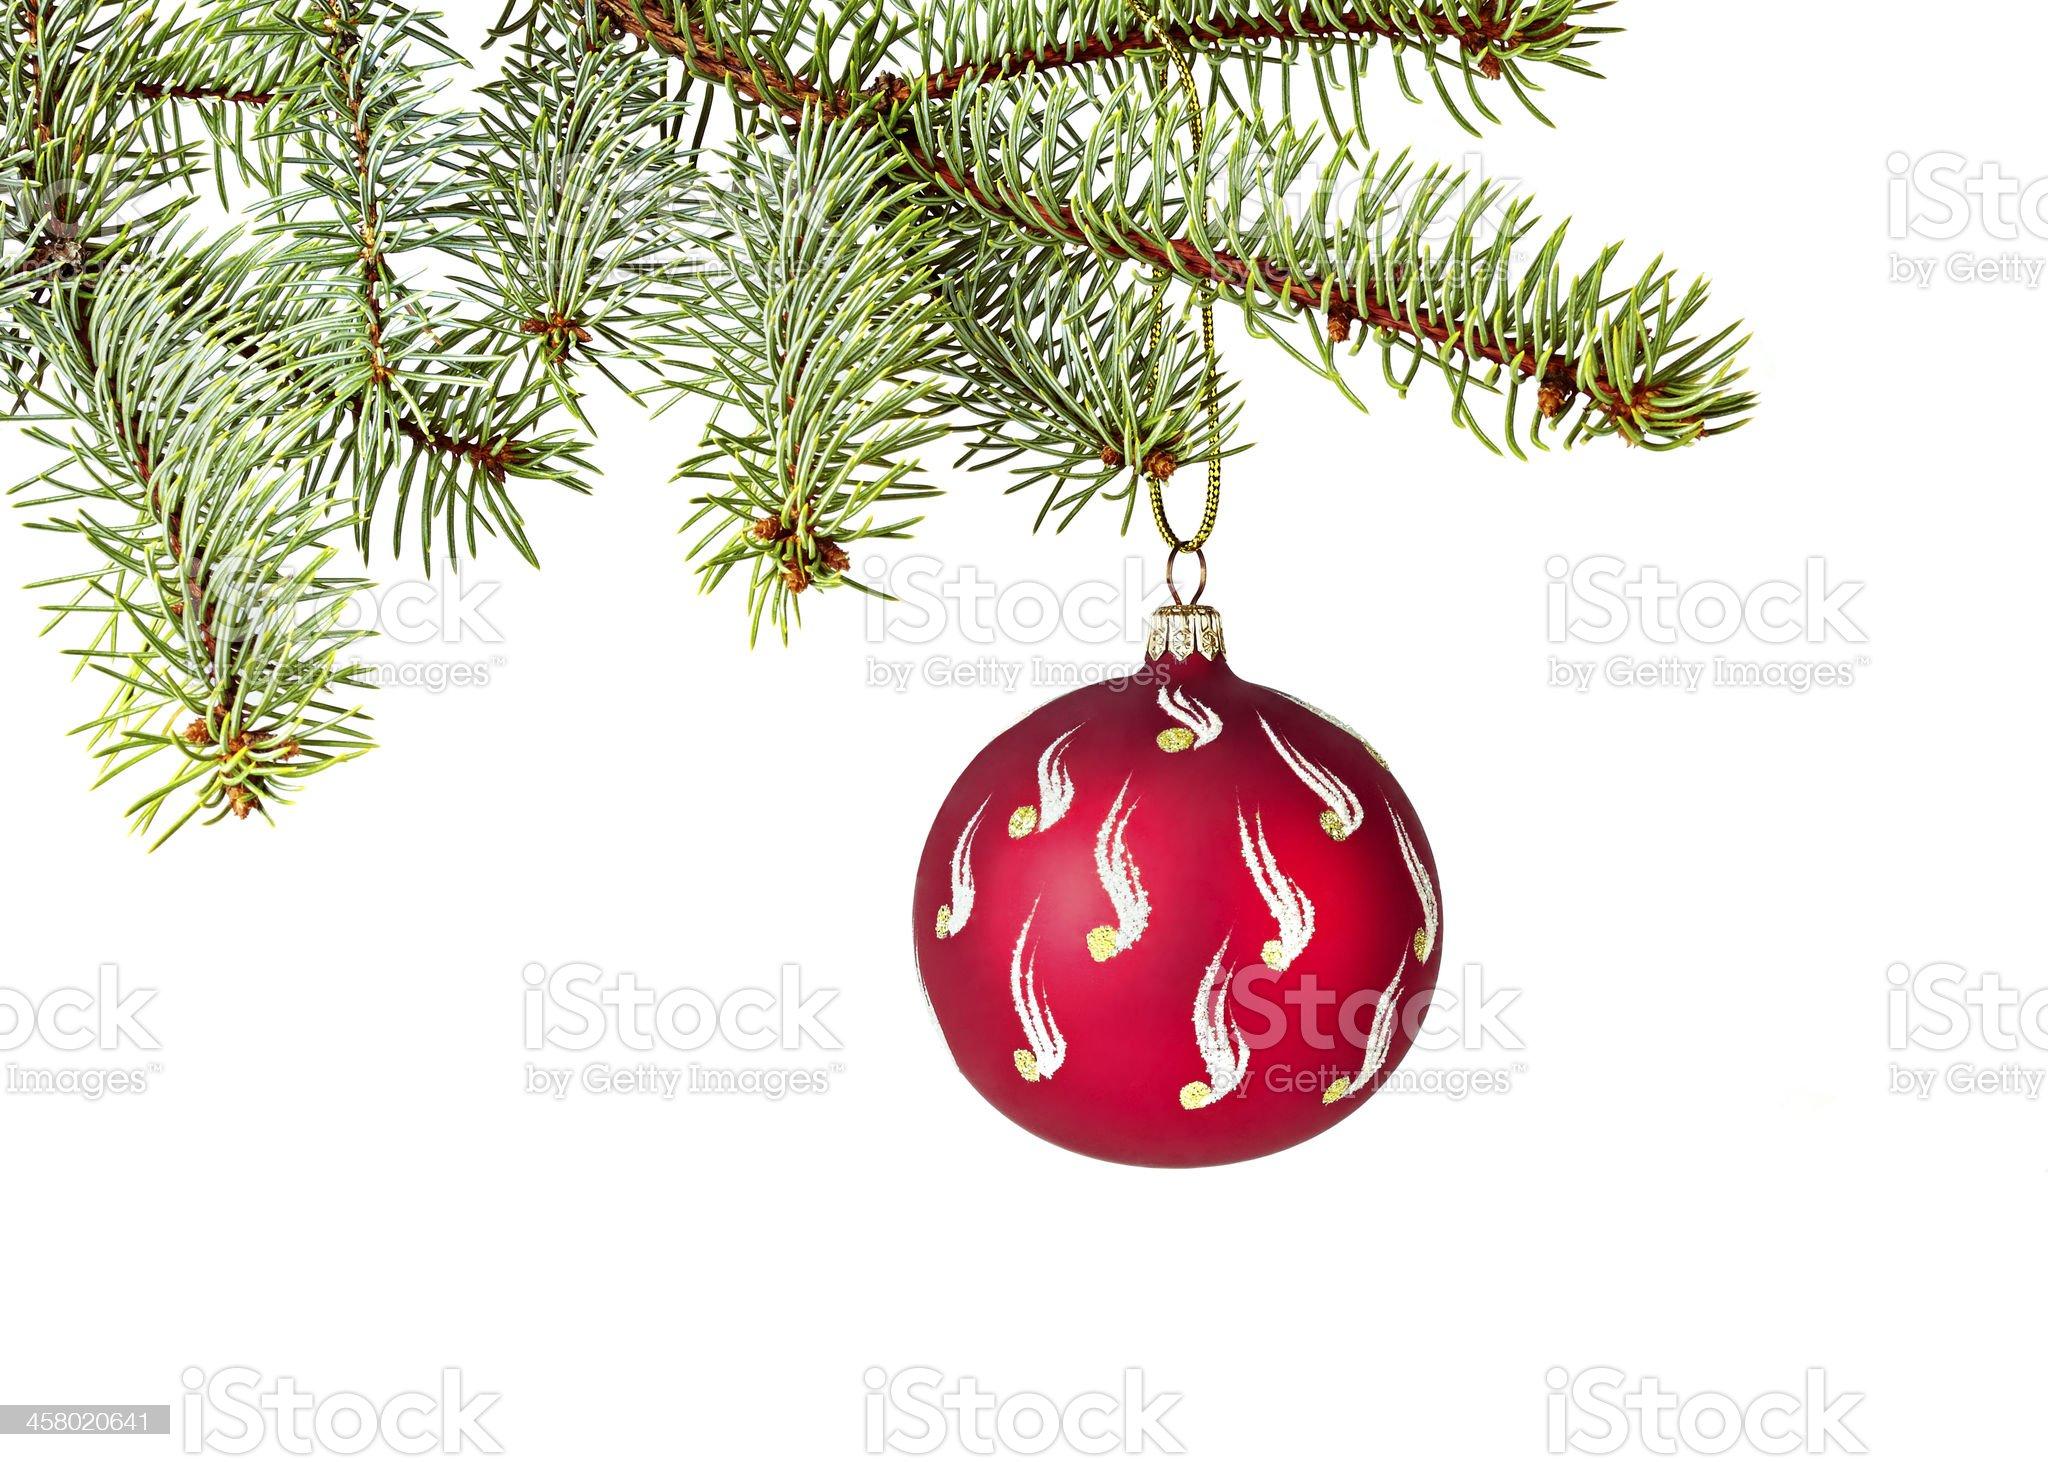 Decorated Christmas tree on white background royalty-free stock photo